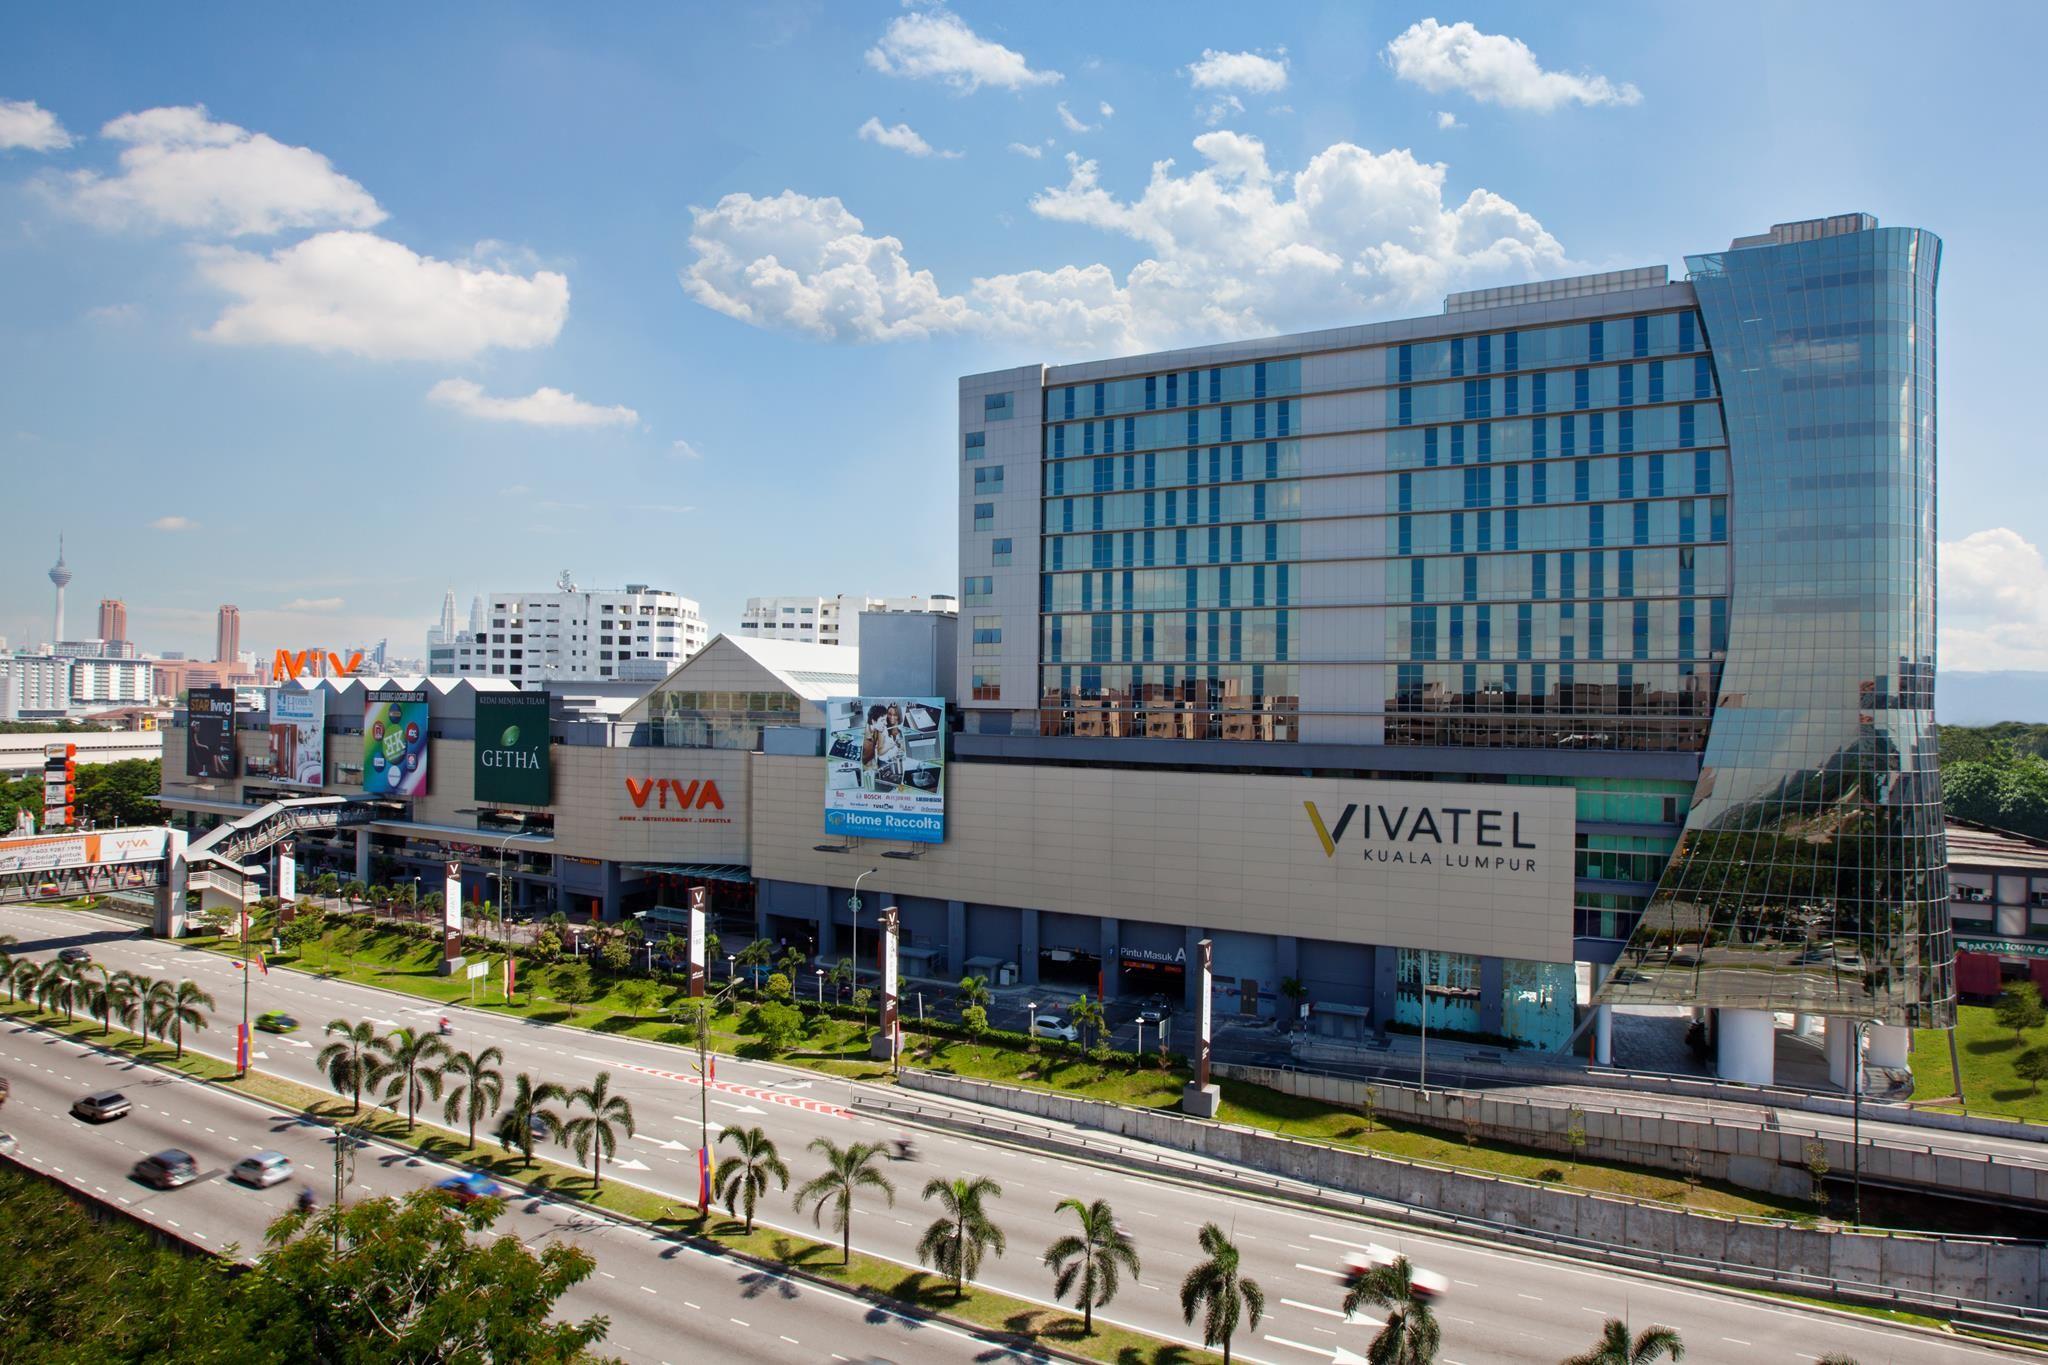 Vivatel Kuala Lumpur,JALAN CHERAS